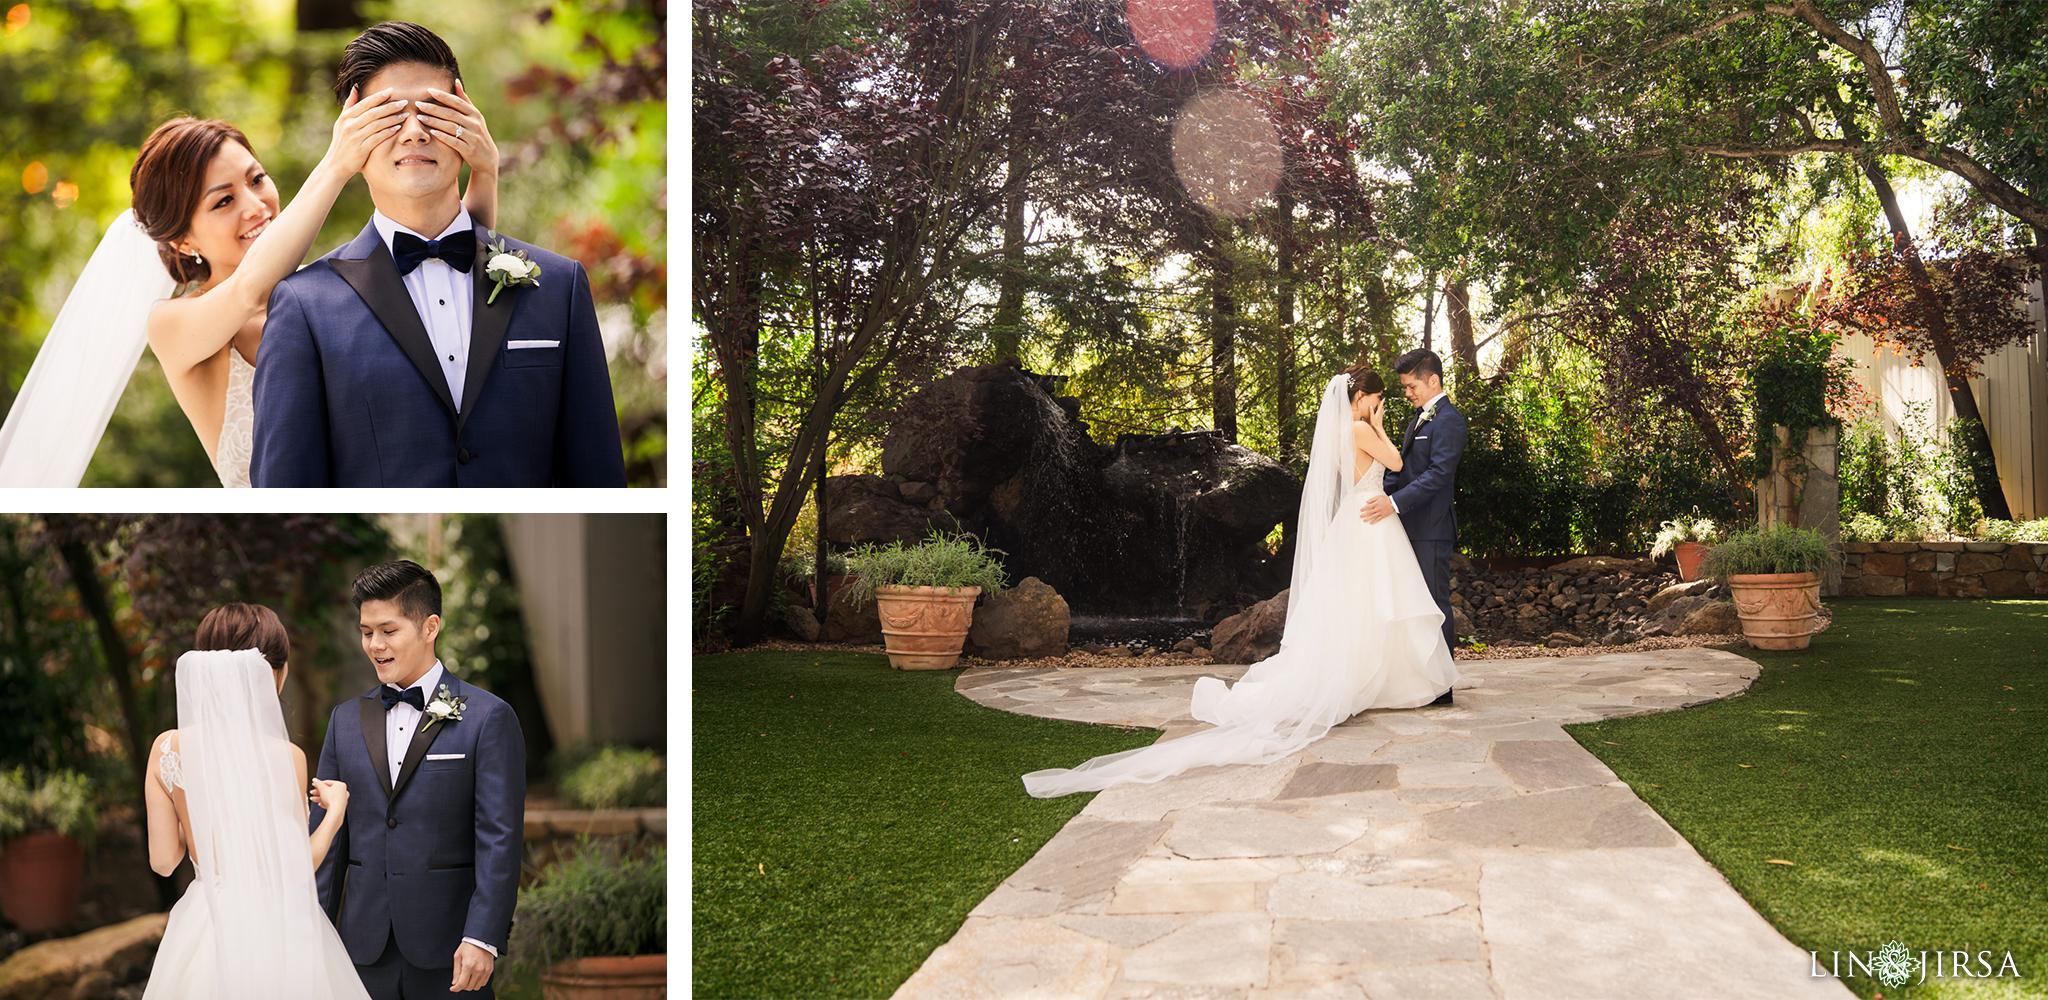 11 Calamigos Ranch Malibu Wedding Photography